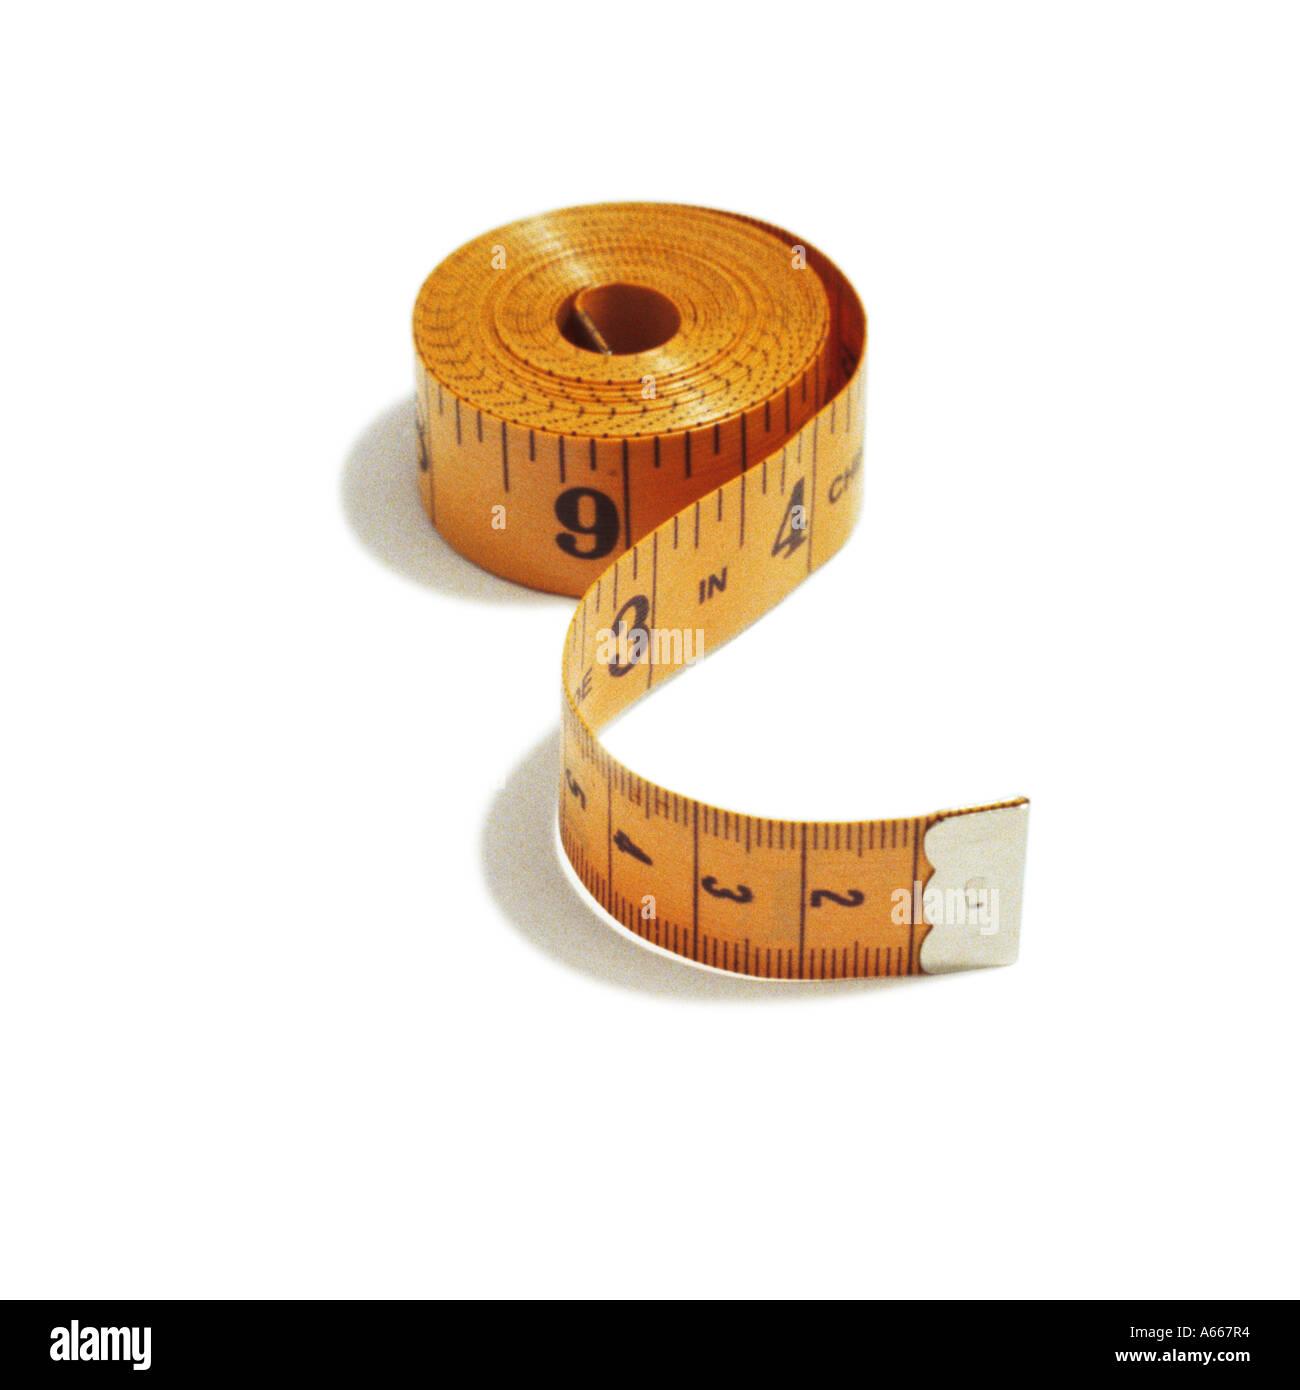 A tape measure - Stock Image